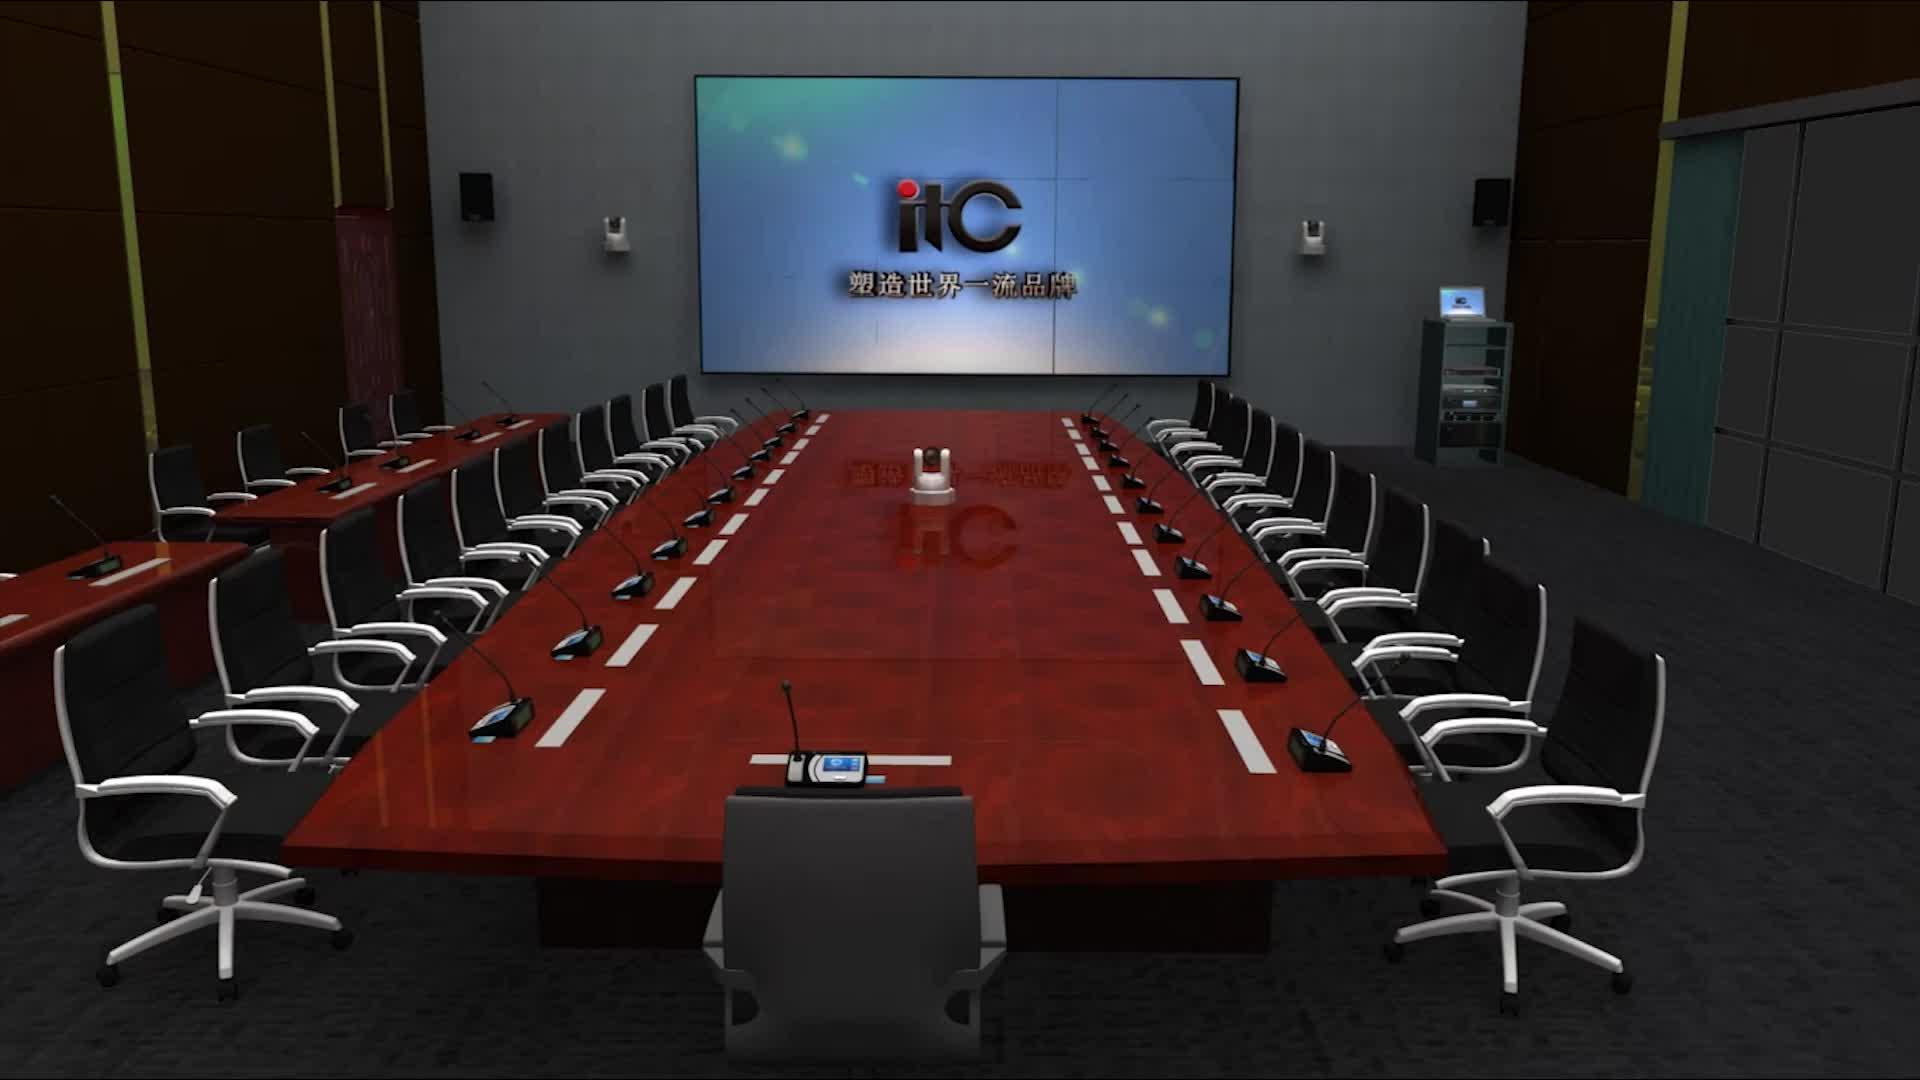 ITC TS-0605M Serie Conferentieruimte Audio Systeem Digitale Audio Conferentie Systeem